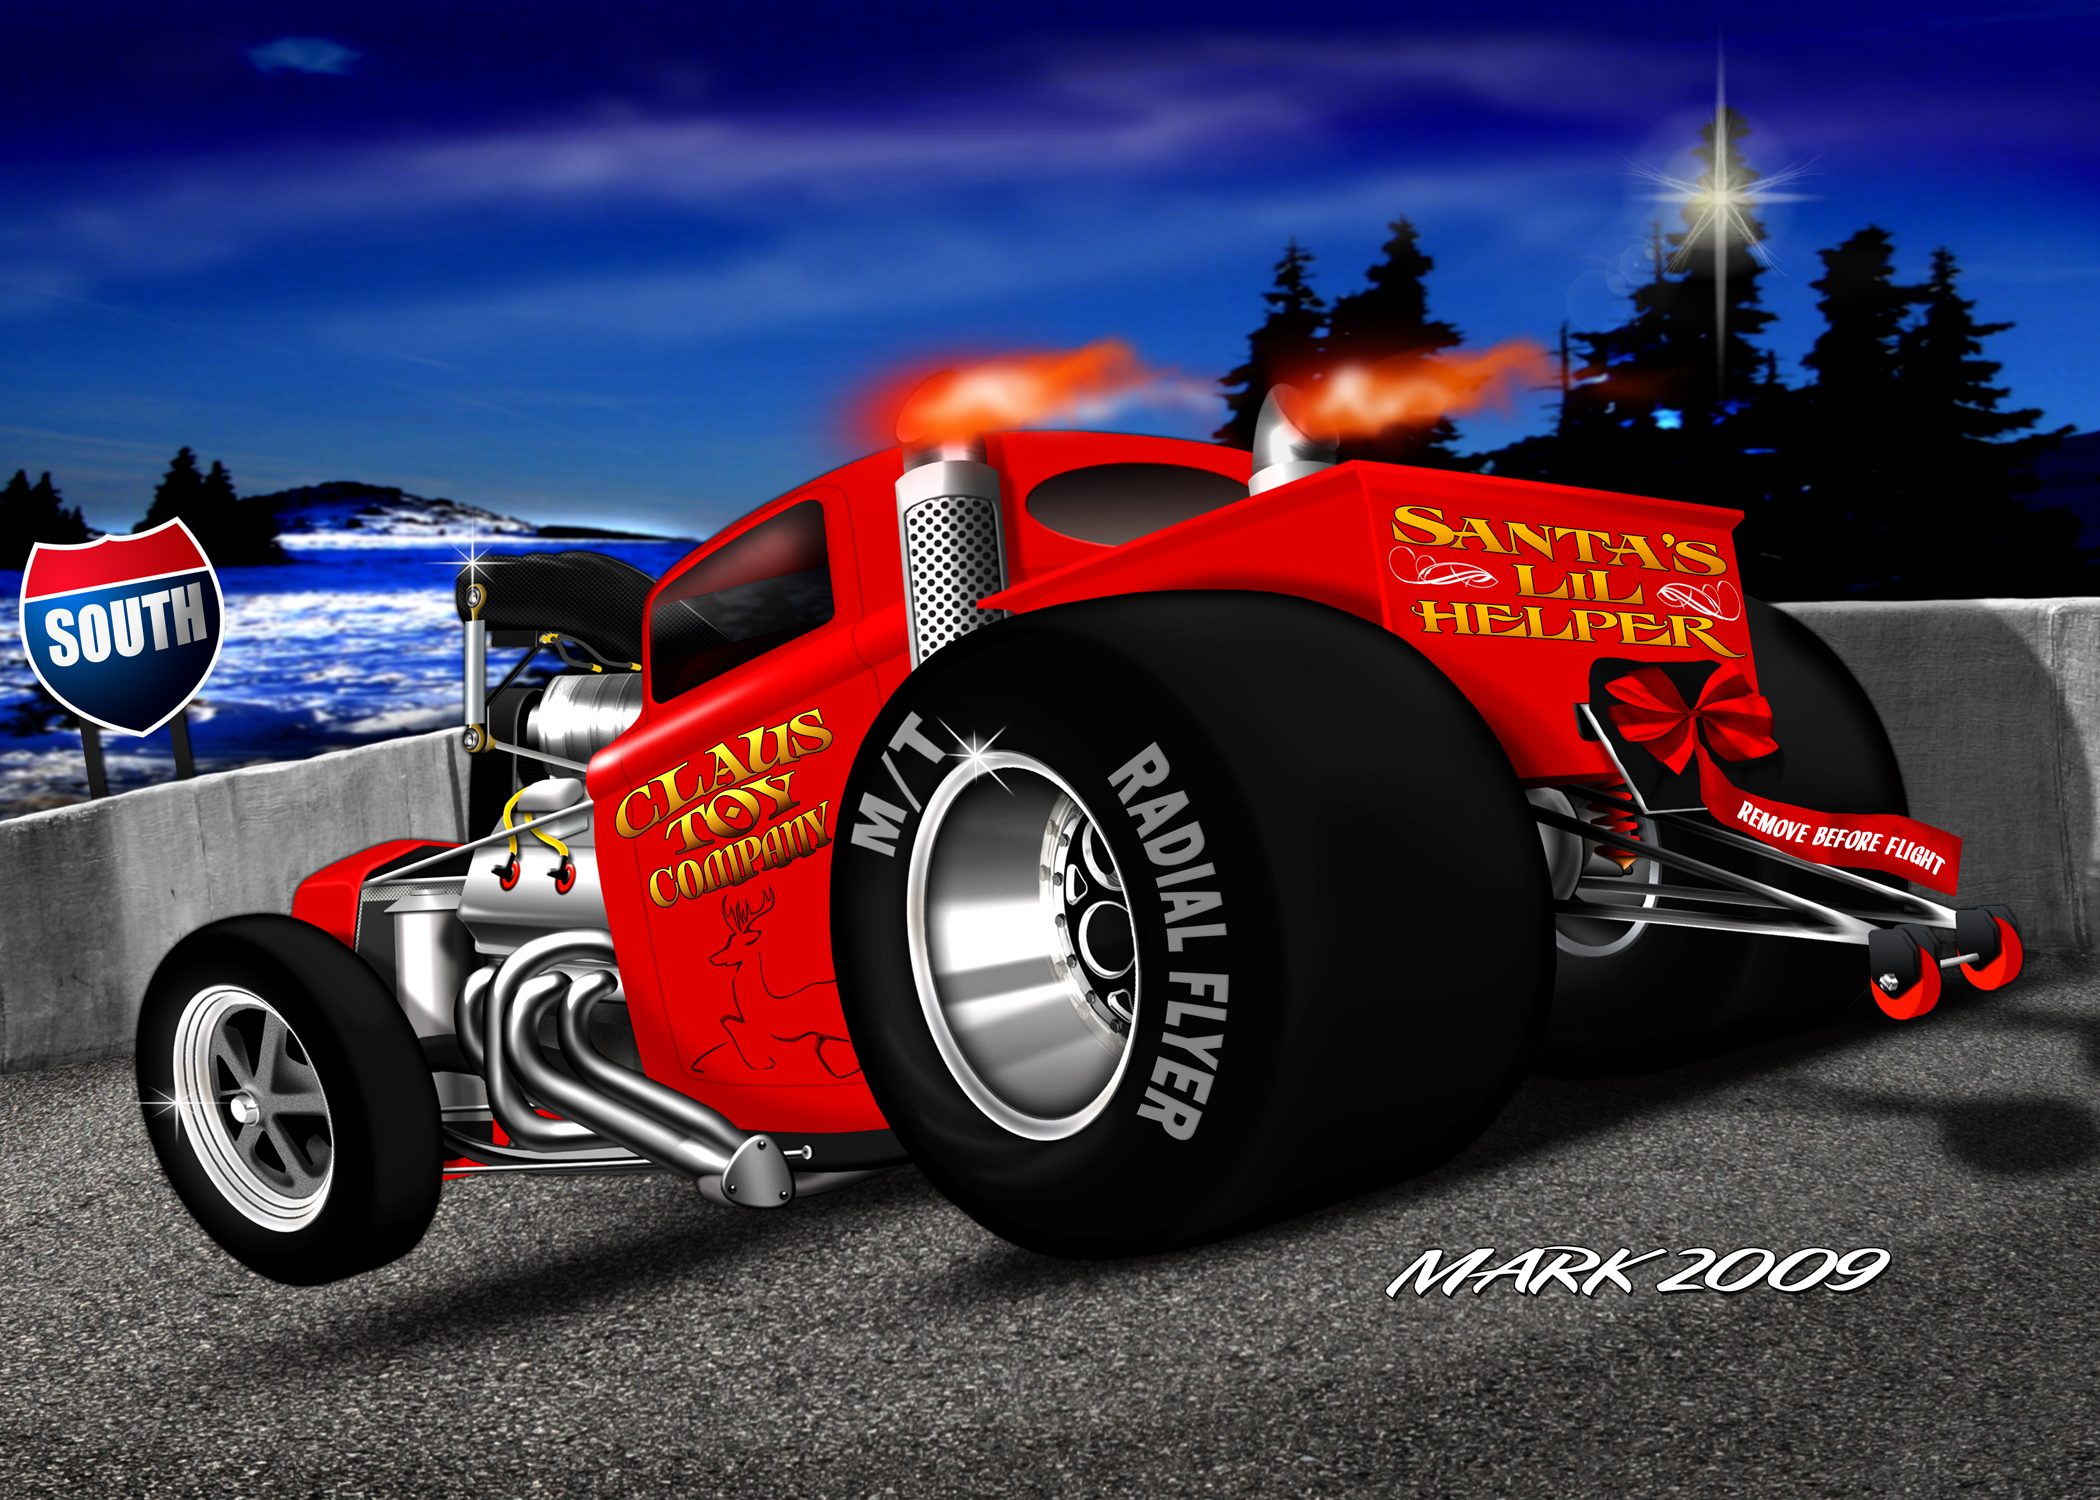 Christmas Hot Rod Cards, Merry Christmas Guys - Draglist.com Drag Racing